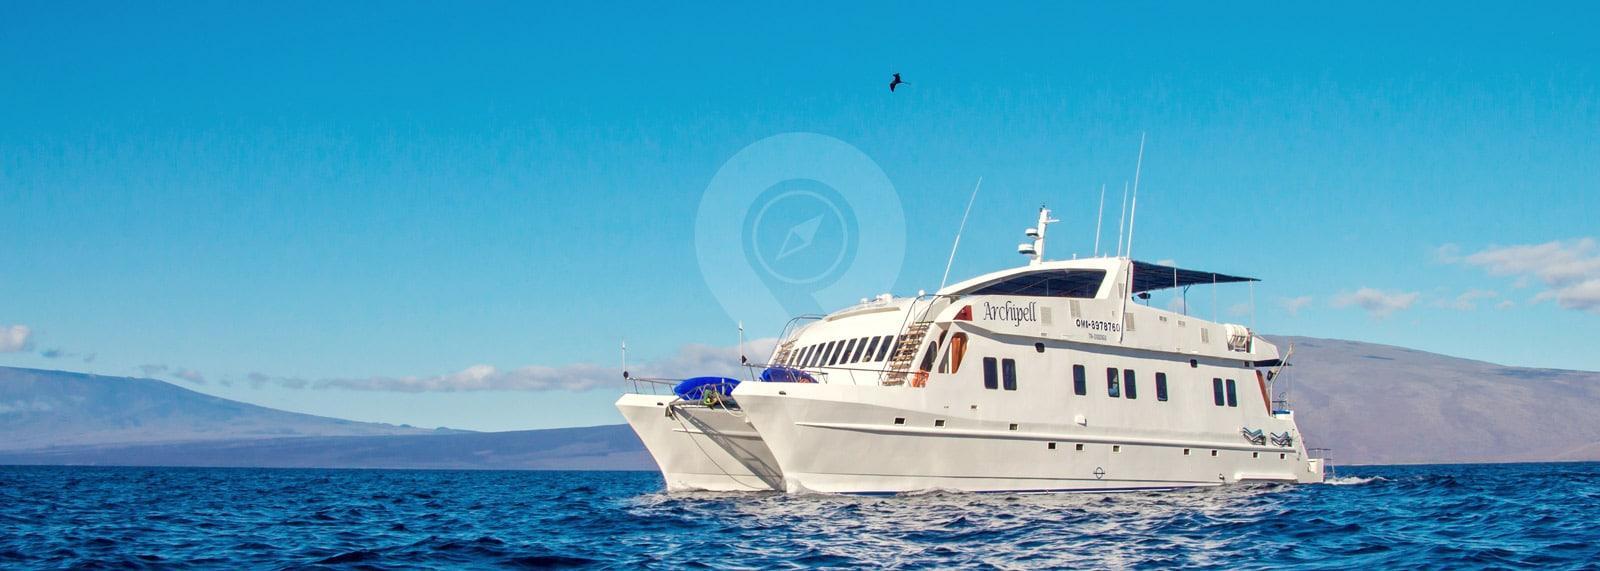 Archipel 1 Galapagos Catamaran